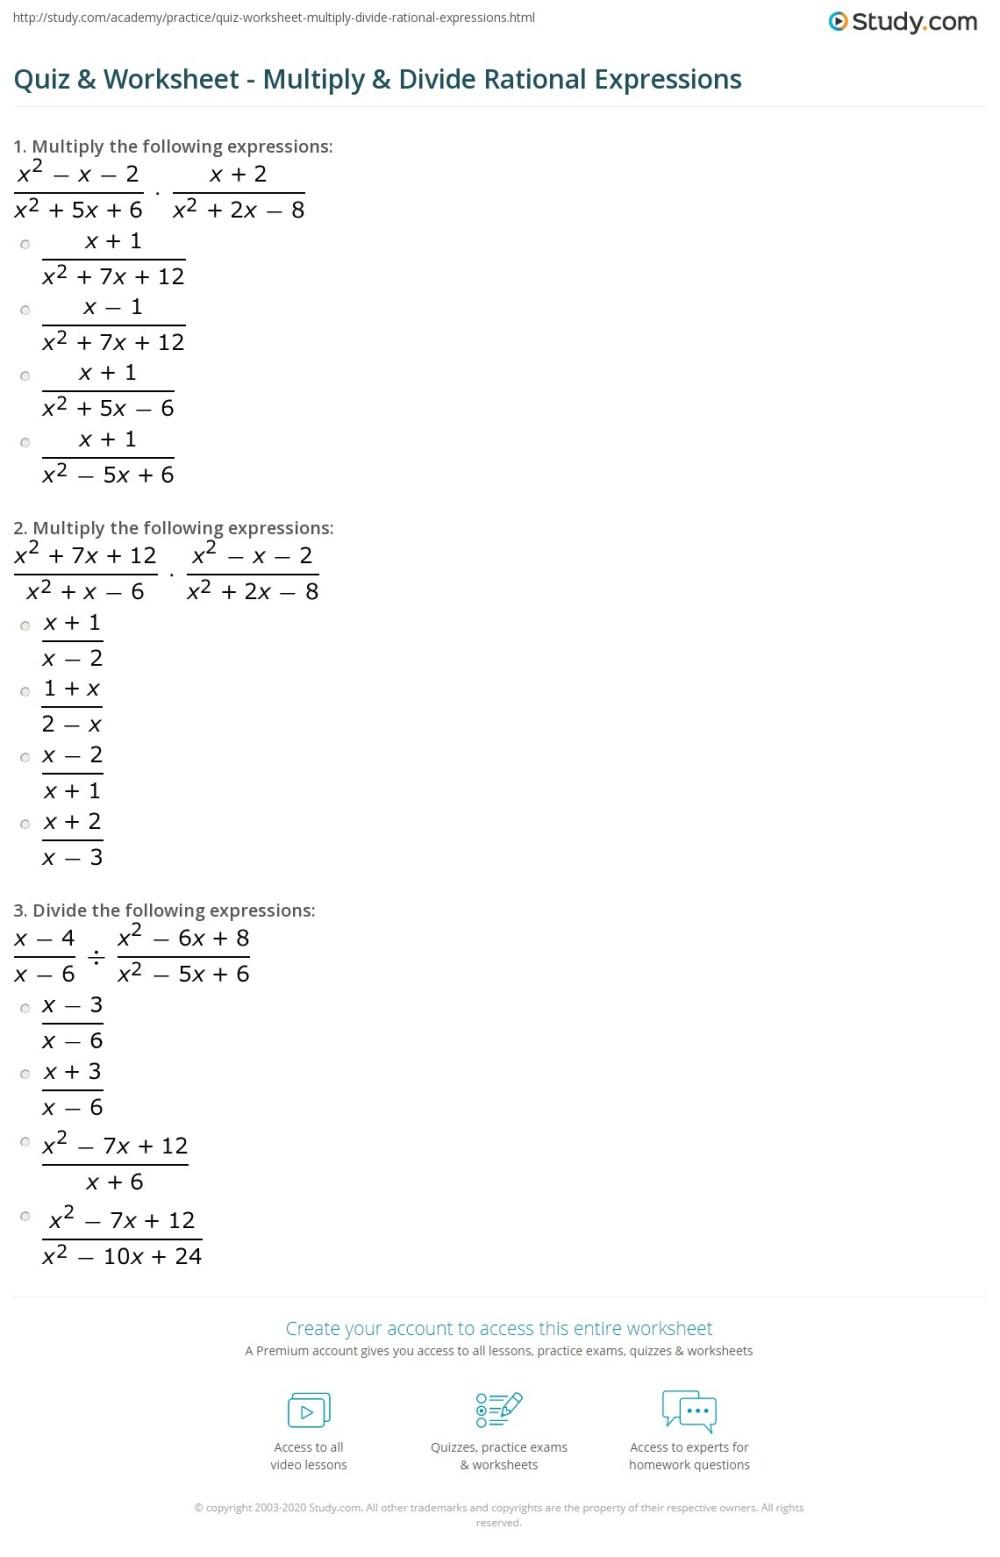 medium resolution of Quiz \u0026 Worksheet - Multiply \u0026 Divide Rational Expressions   Study.com